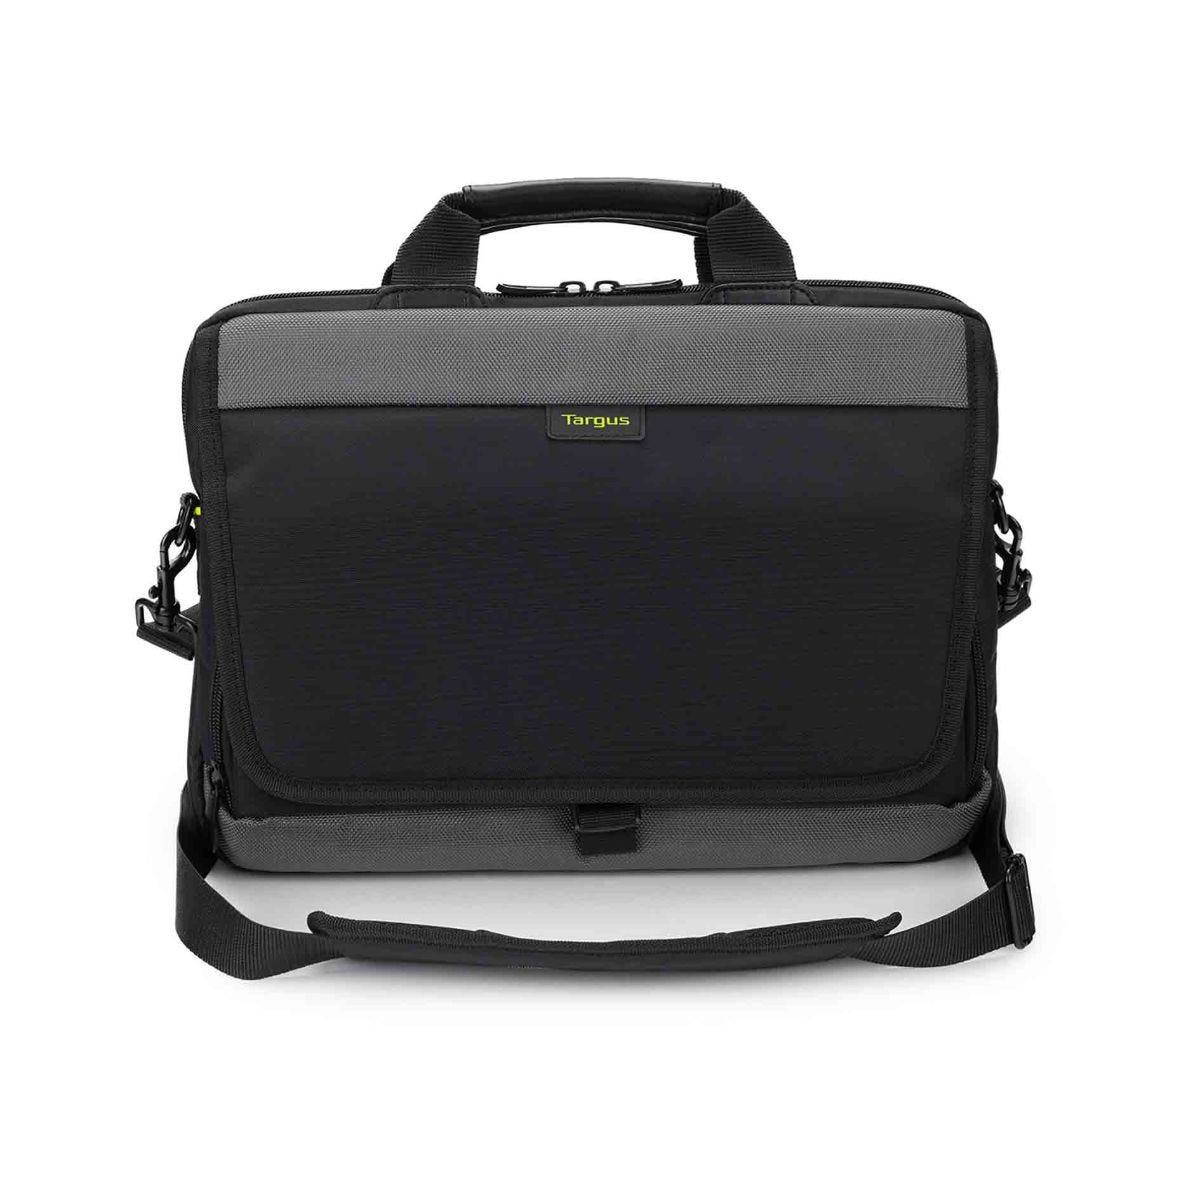 Image of Targus CityGear Slim Topload Laptop Case 12-14 Inch, Black